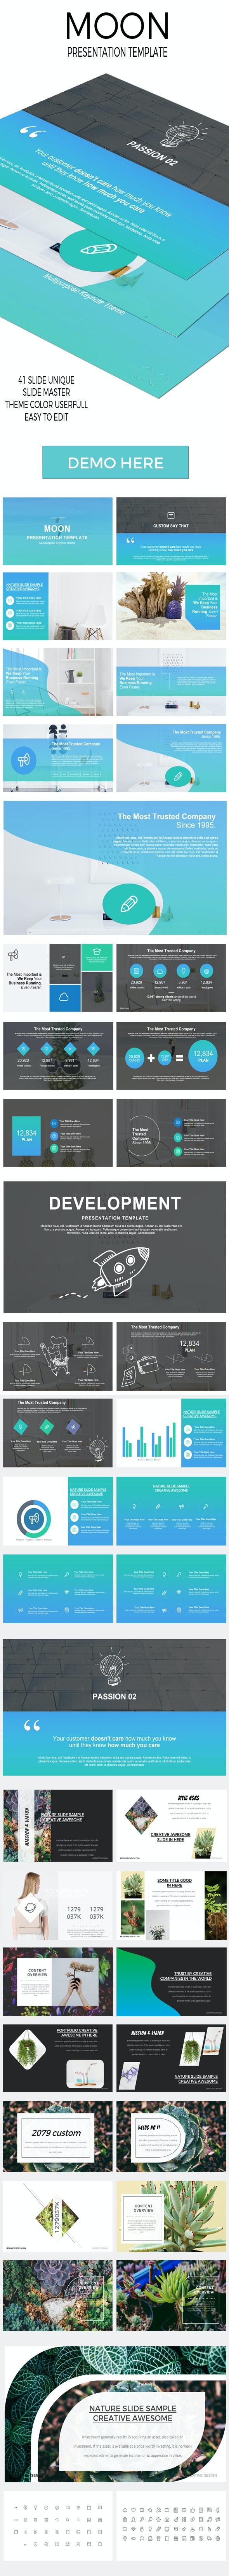 Moon Powerpoint Presentation Template - PowerPoint Templates Presentation Templates